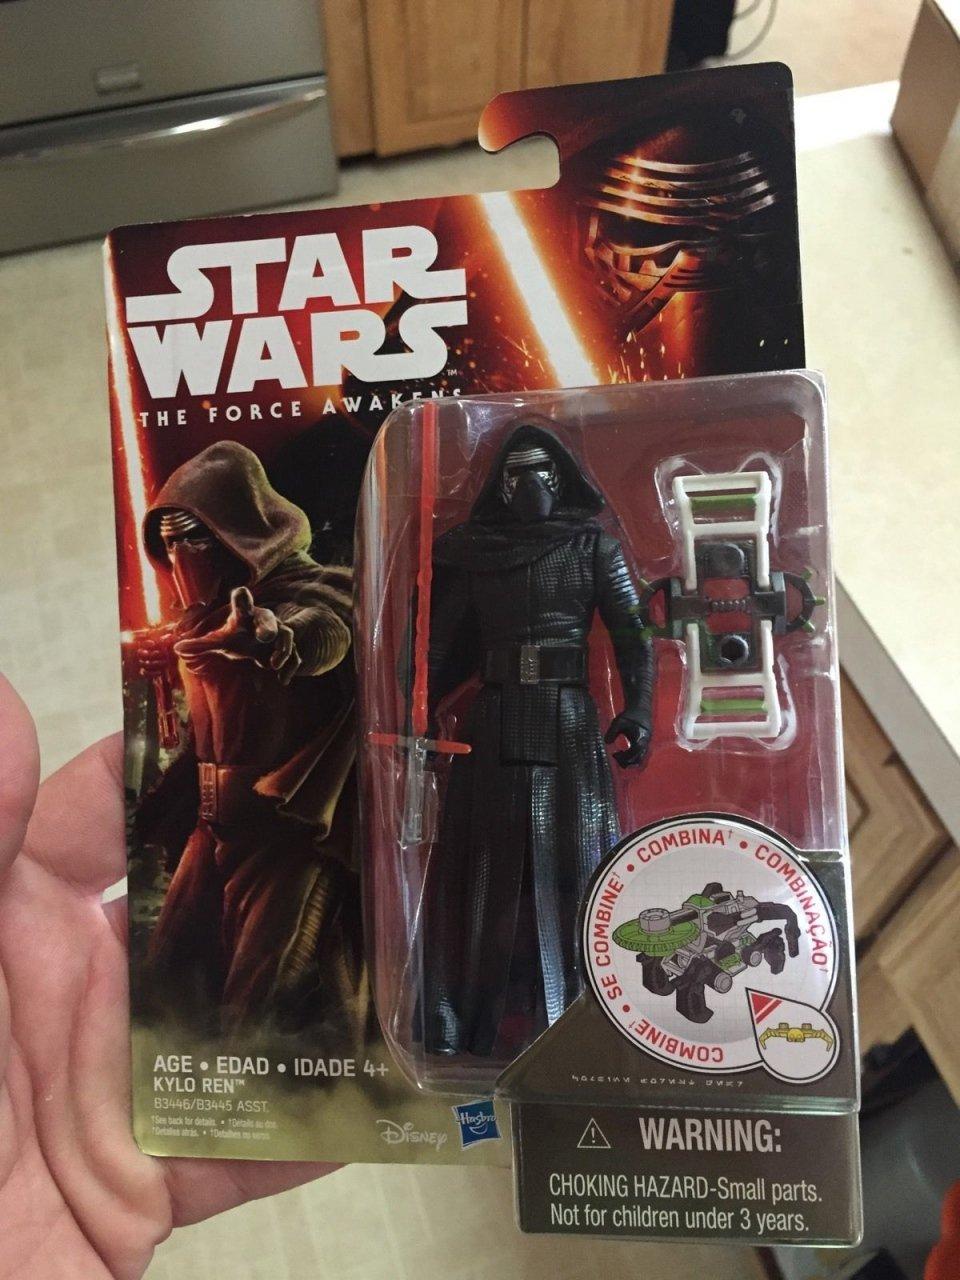 Leaked The Force Awakens Kylo Ren Action Figure Sells on eBay